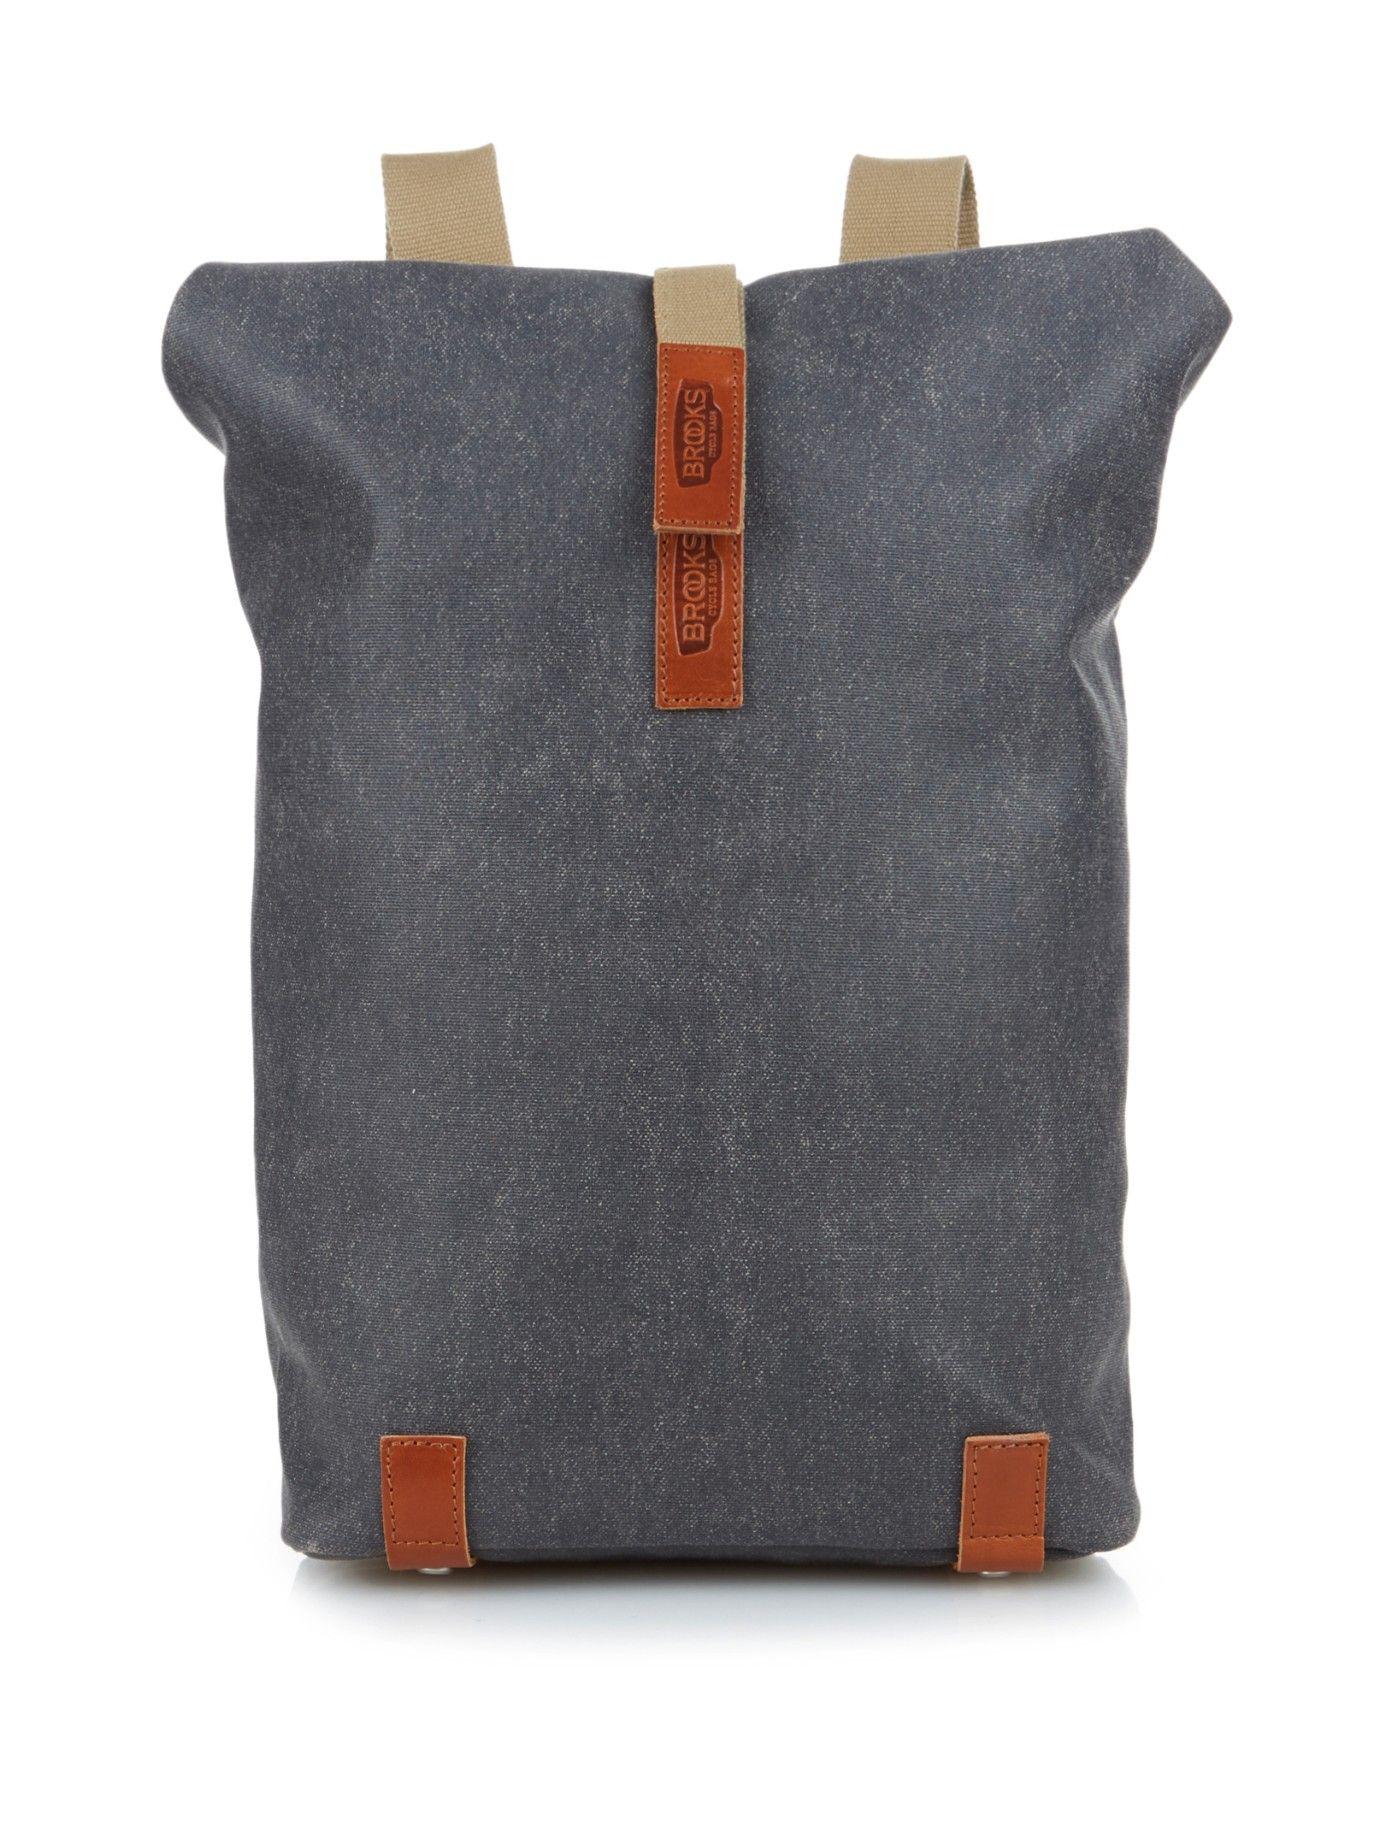 01b863bc1 Pickwick small backpack | Brooks England | kinda futuristic, kinda retro